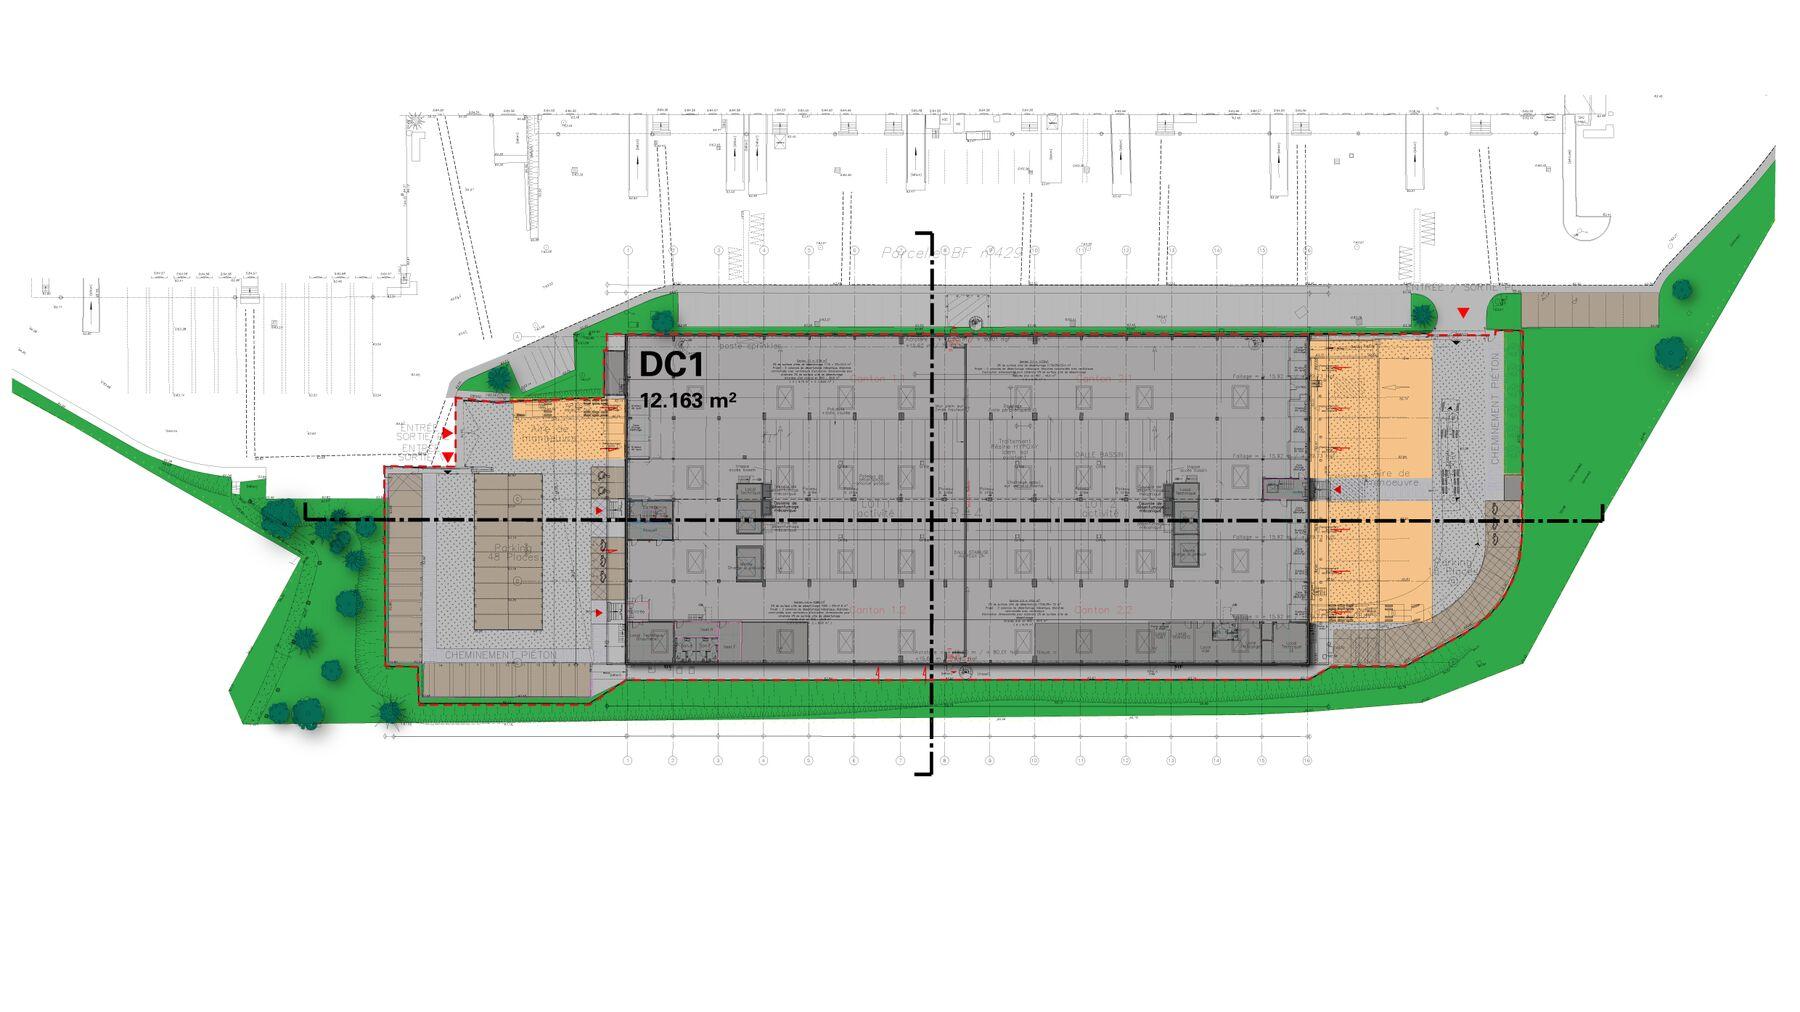 DPM-Rosny-DC1_Site-Layout.jpg